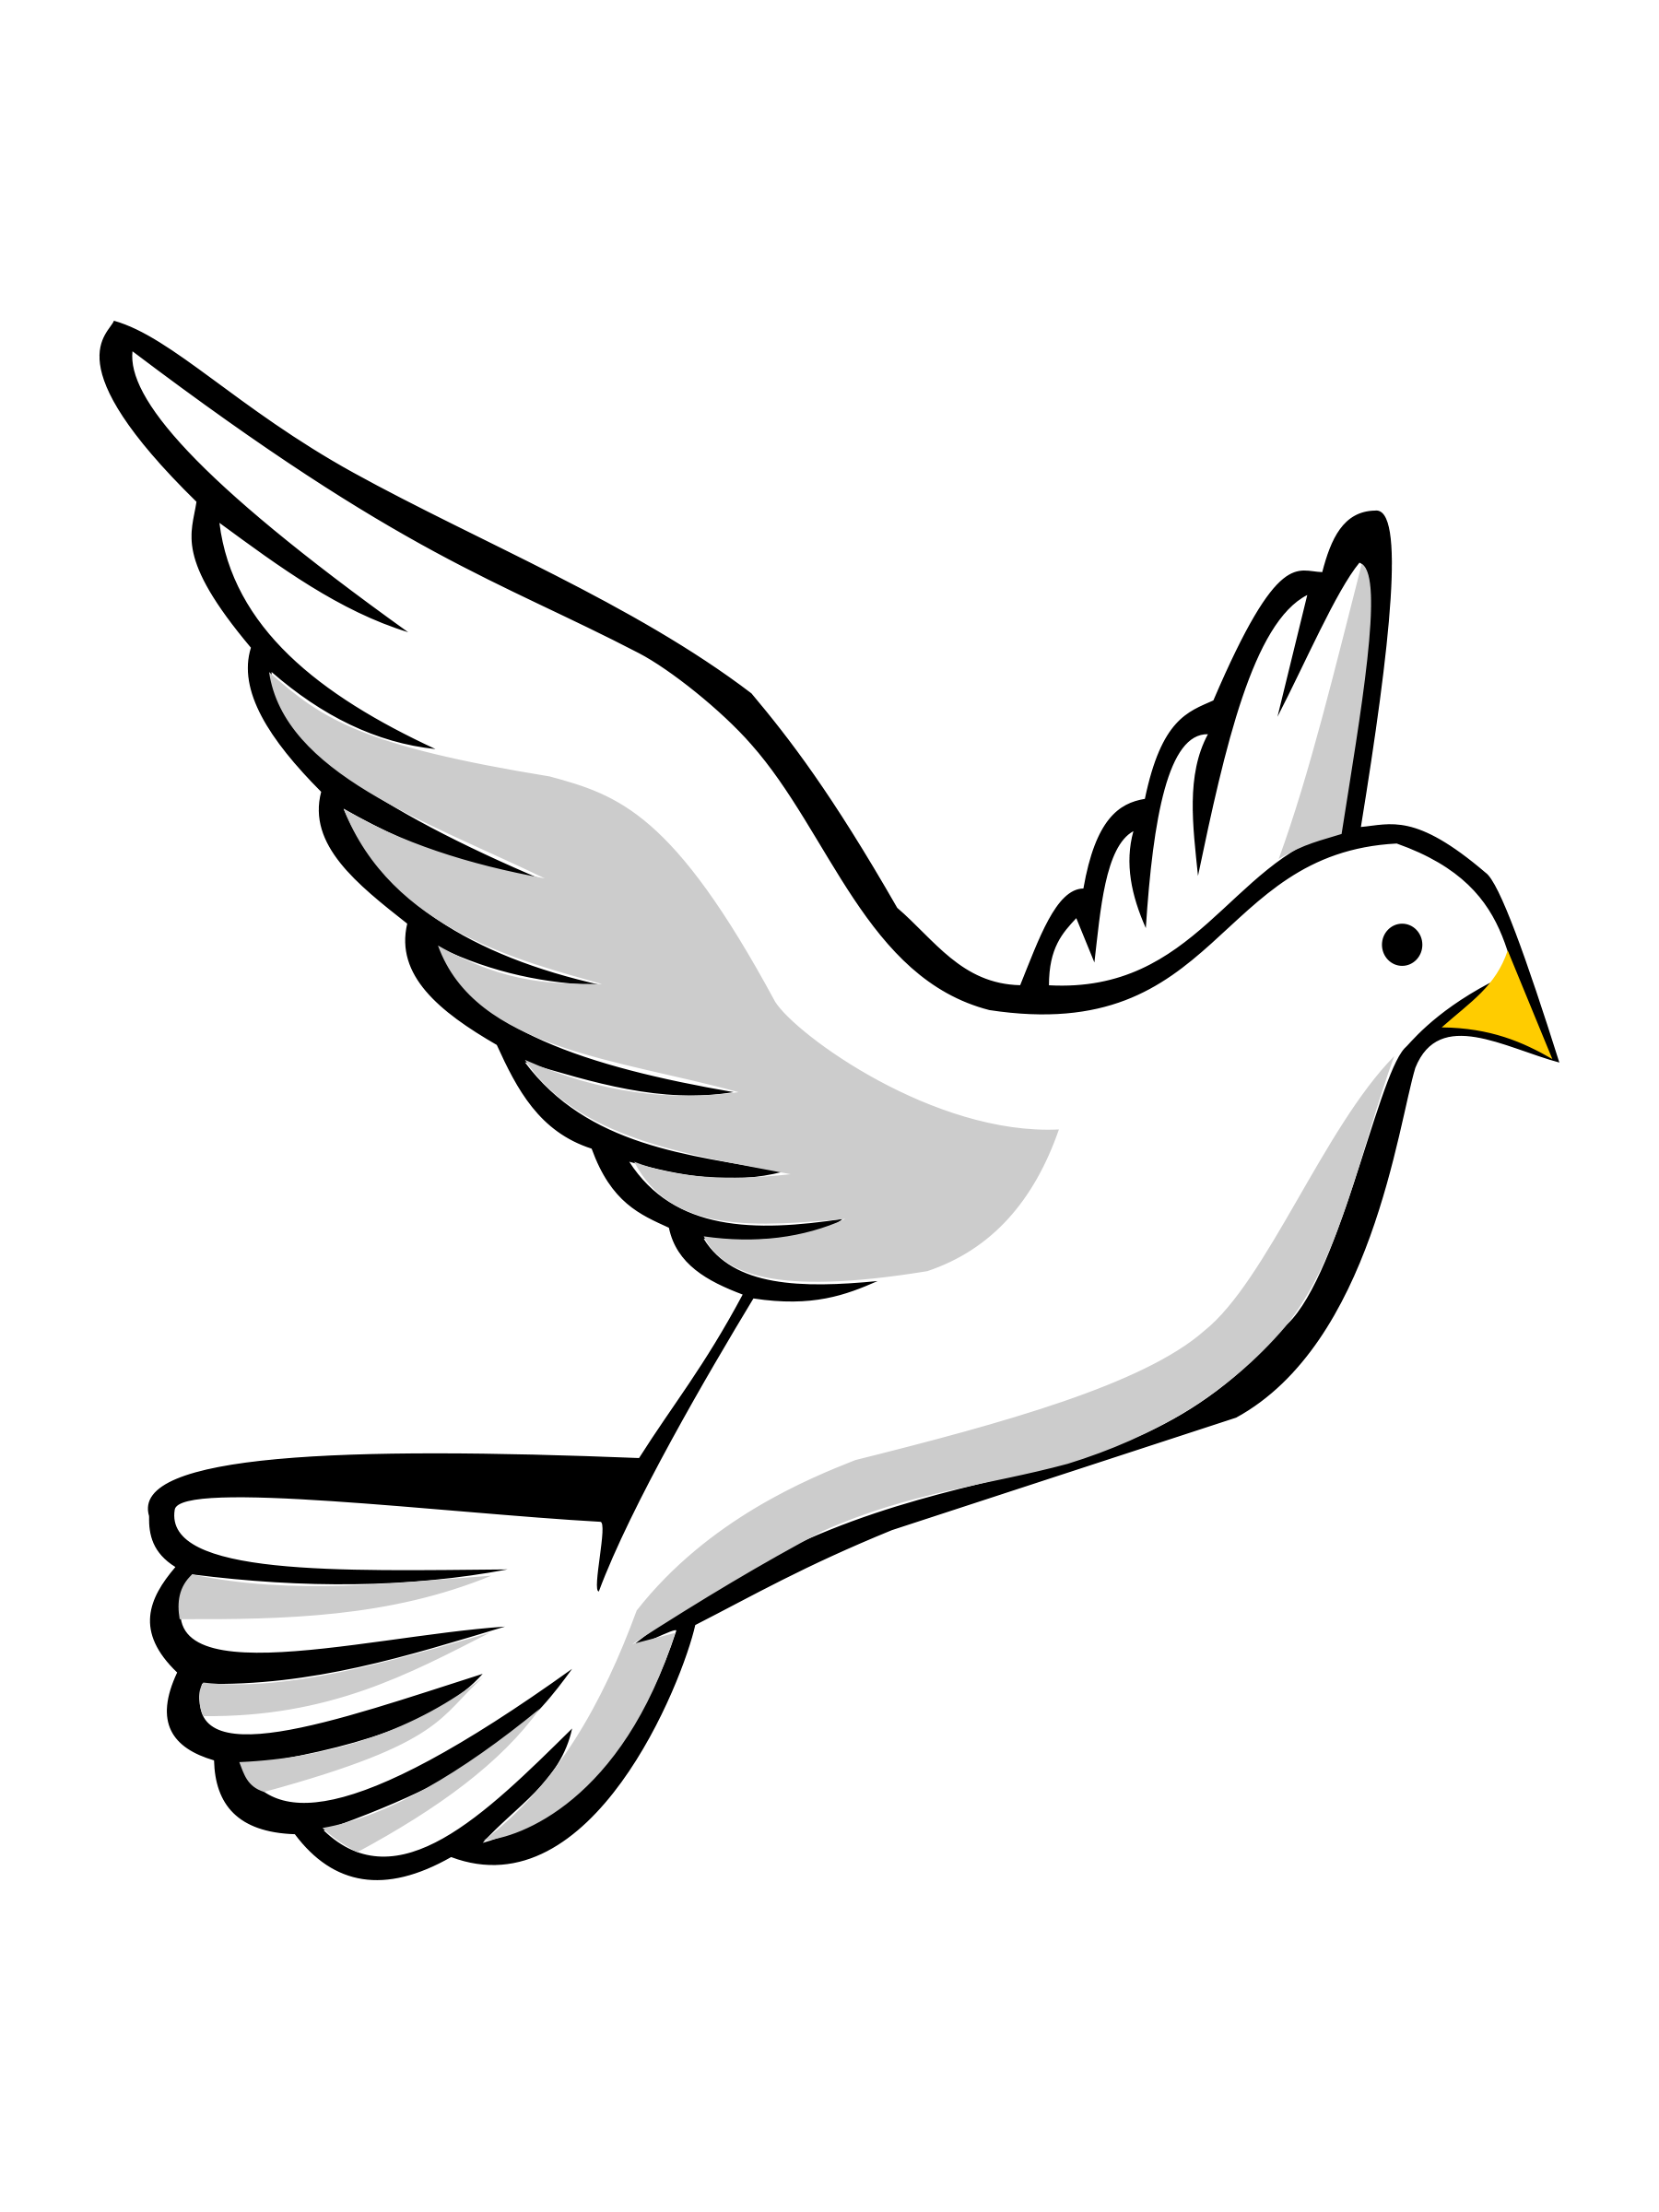 1800x2400 Holy Spirit Dove Clipart Black And White Free 2